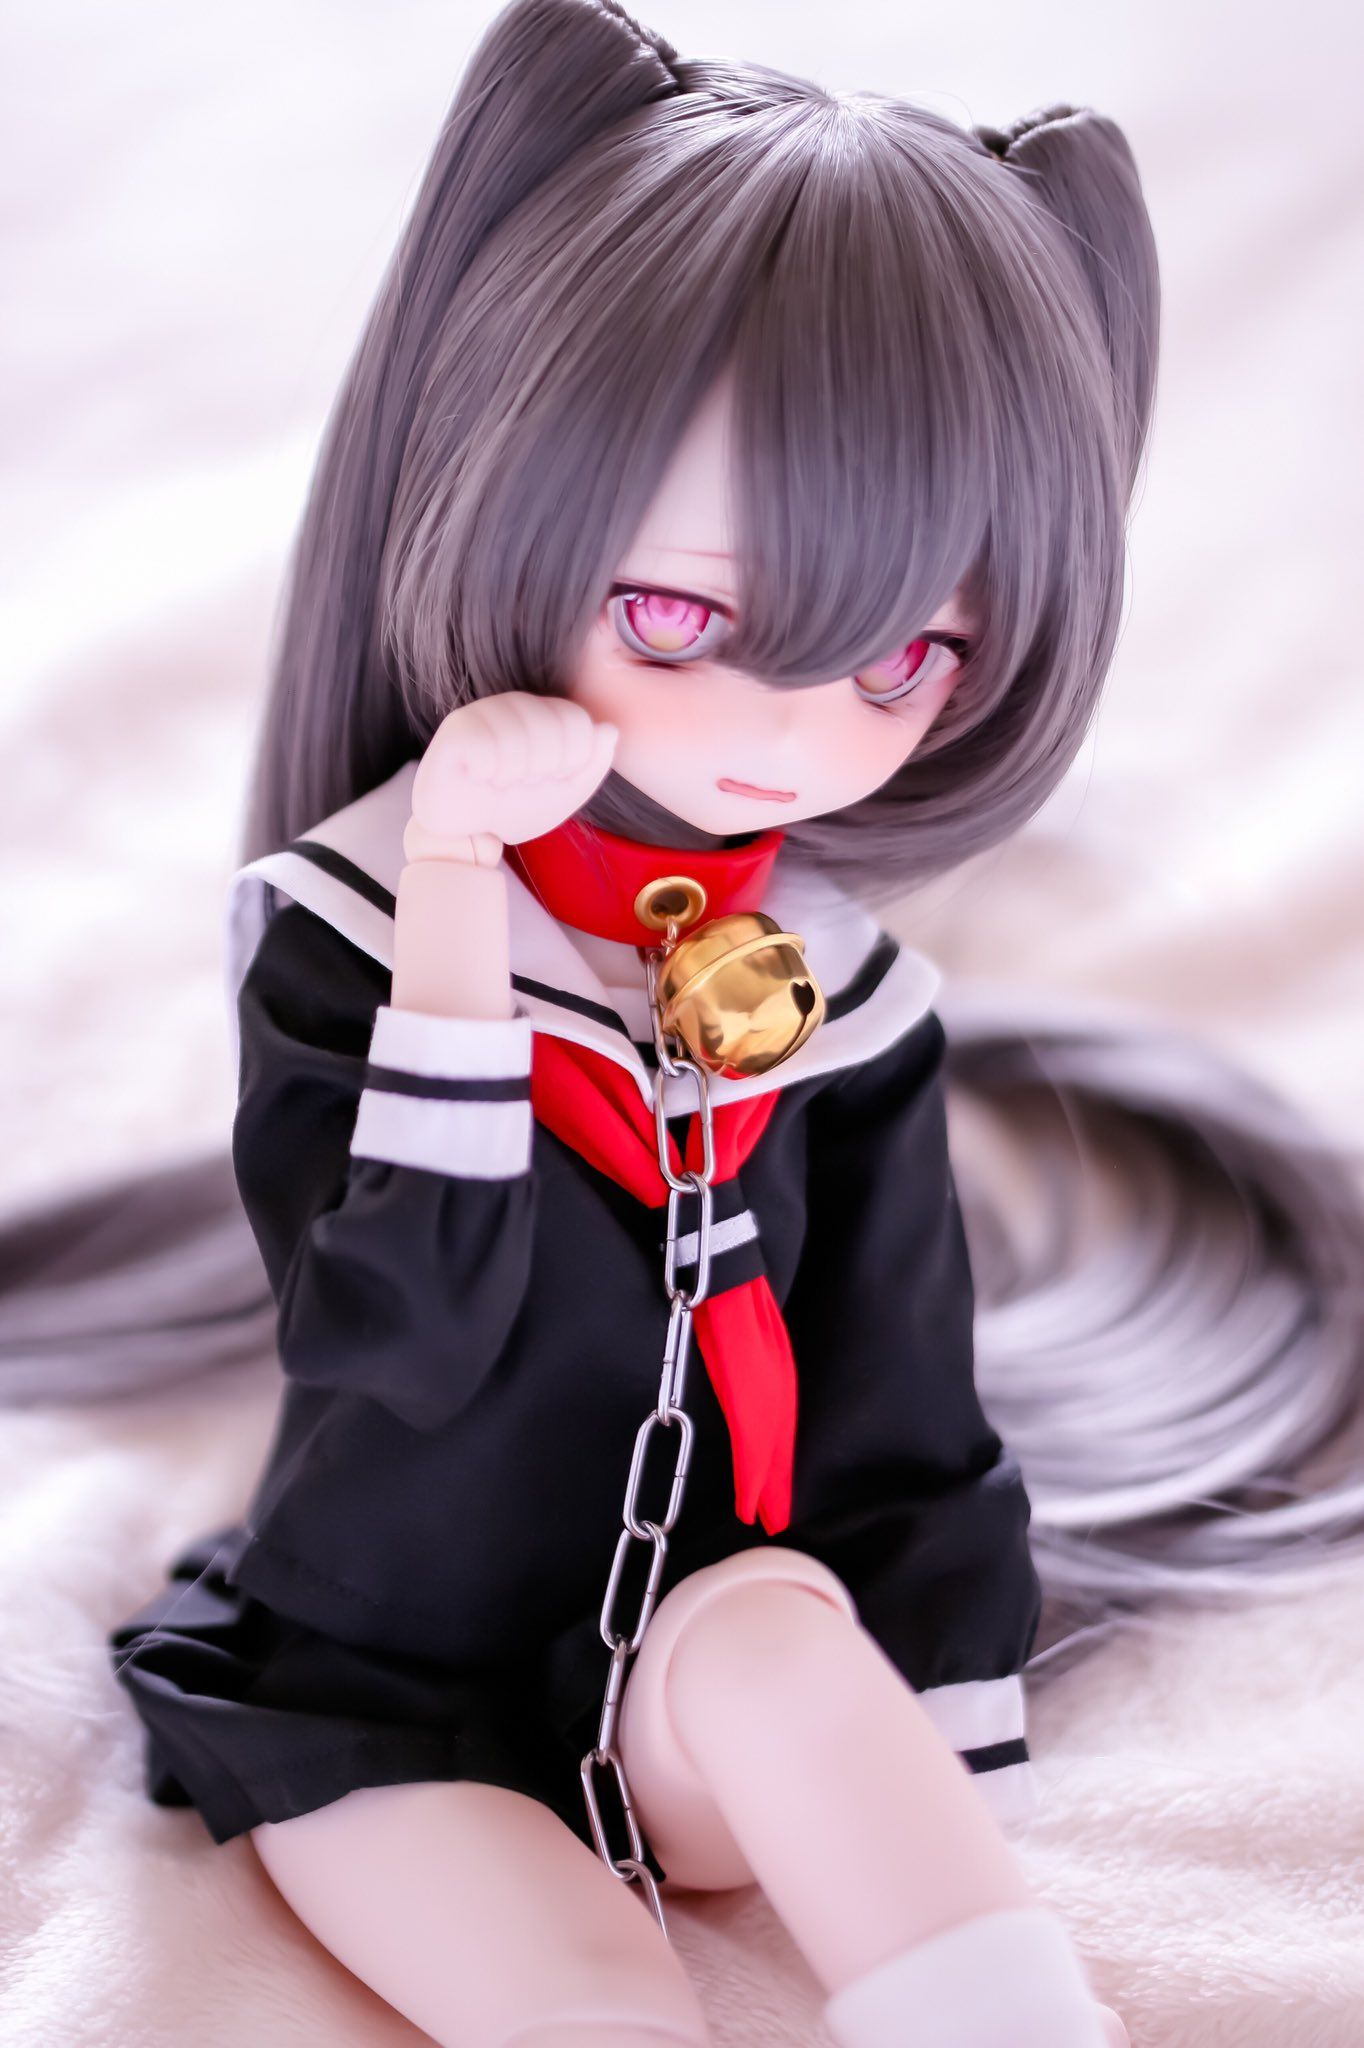 Twitter in 2020 Anime dolls, Kawaii doll, Pretty dolls